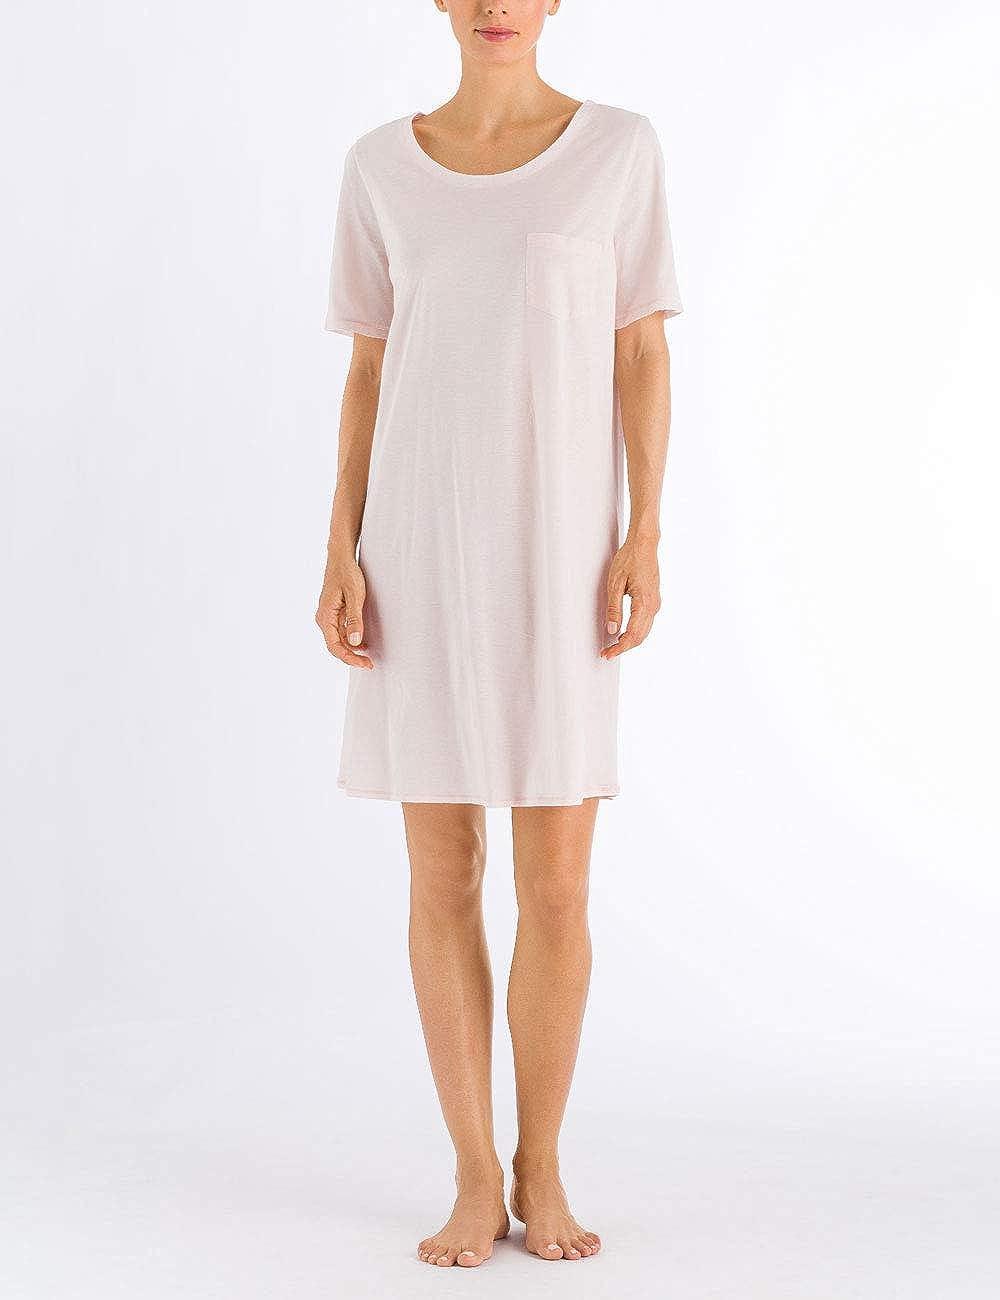 HANRO Women's Cotton Short...